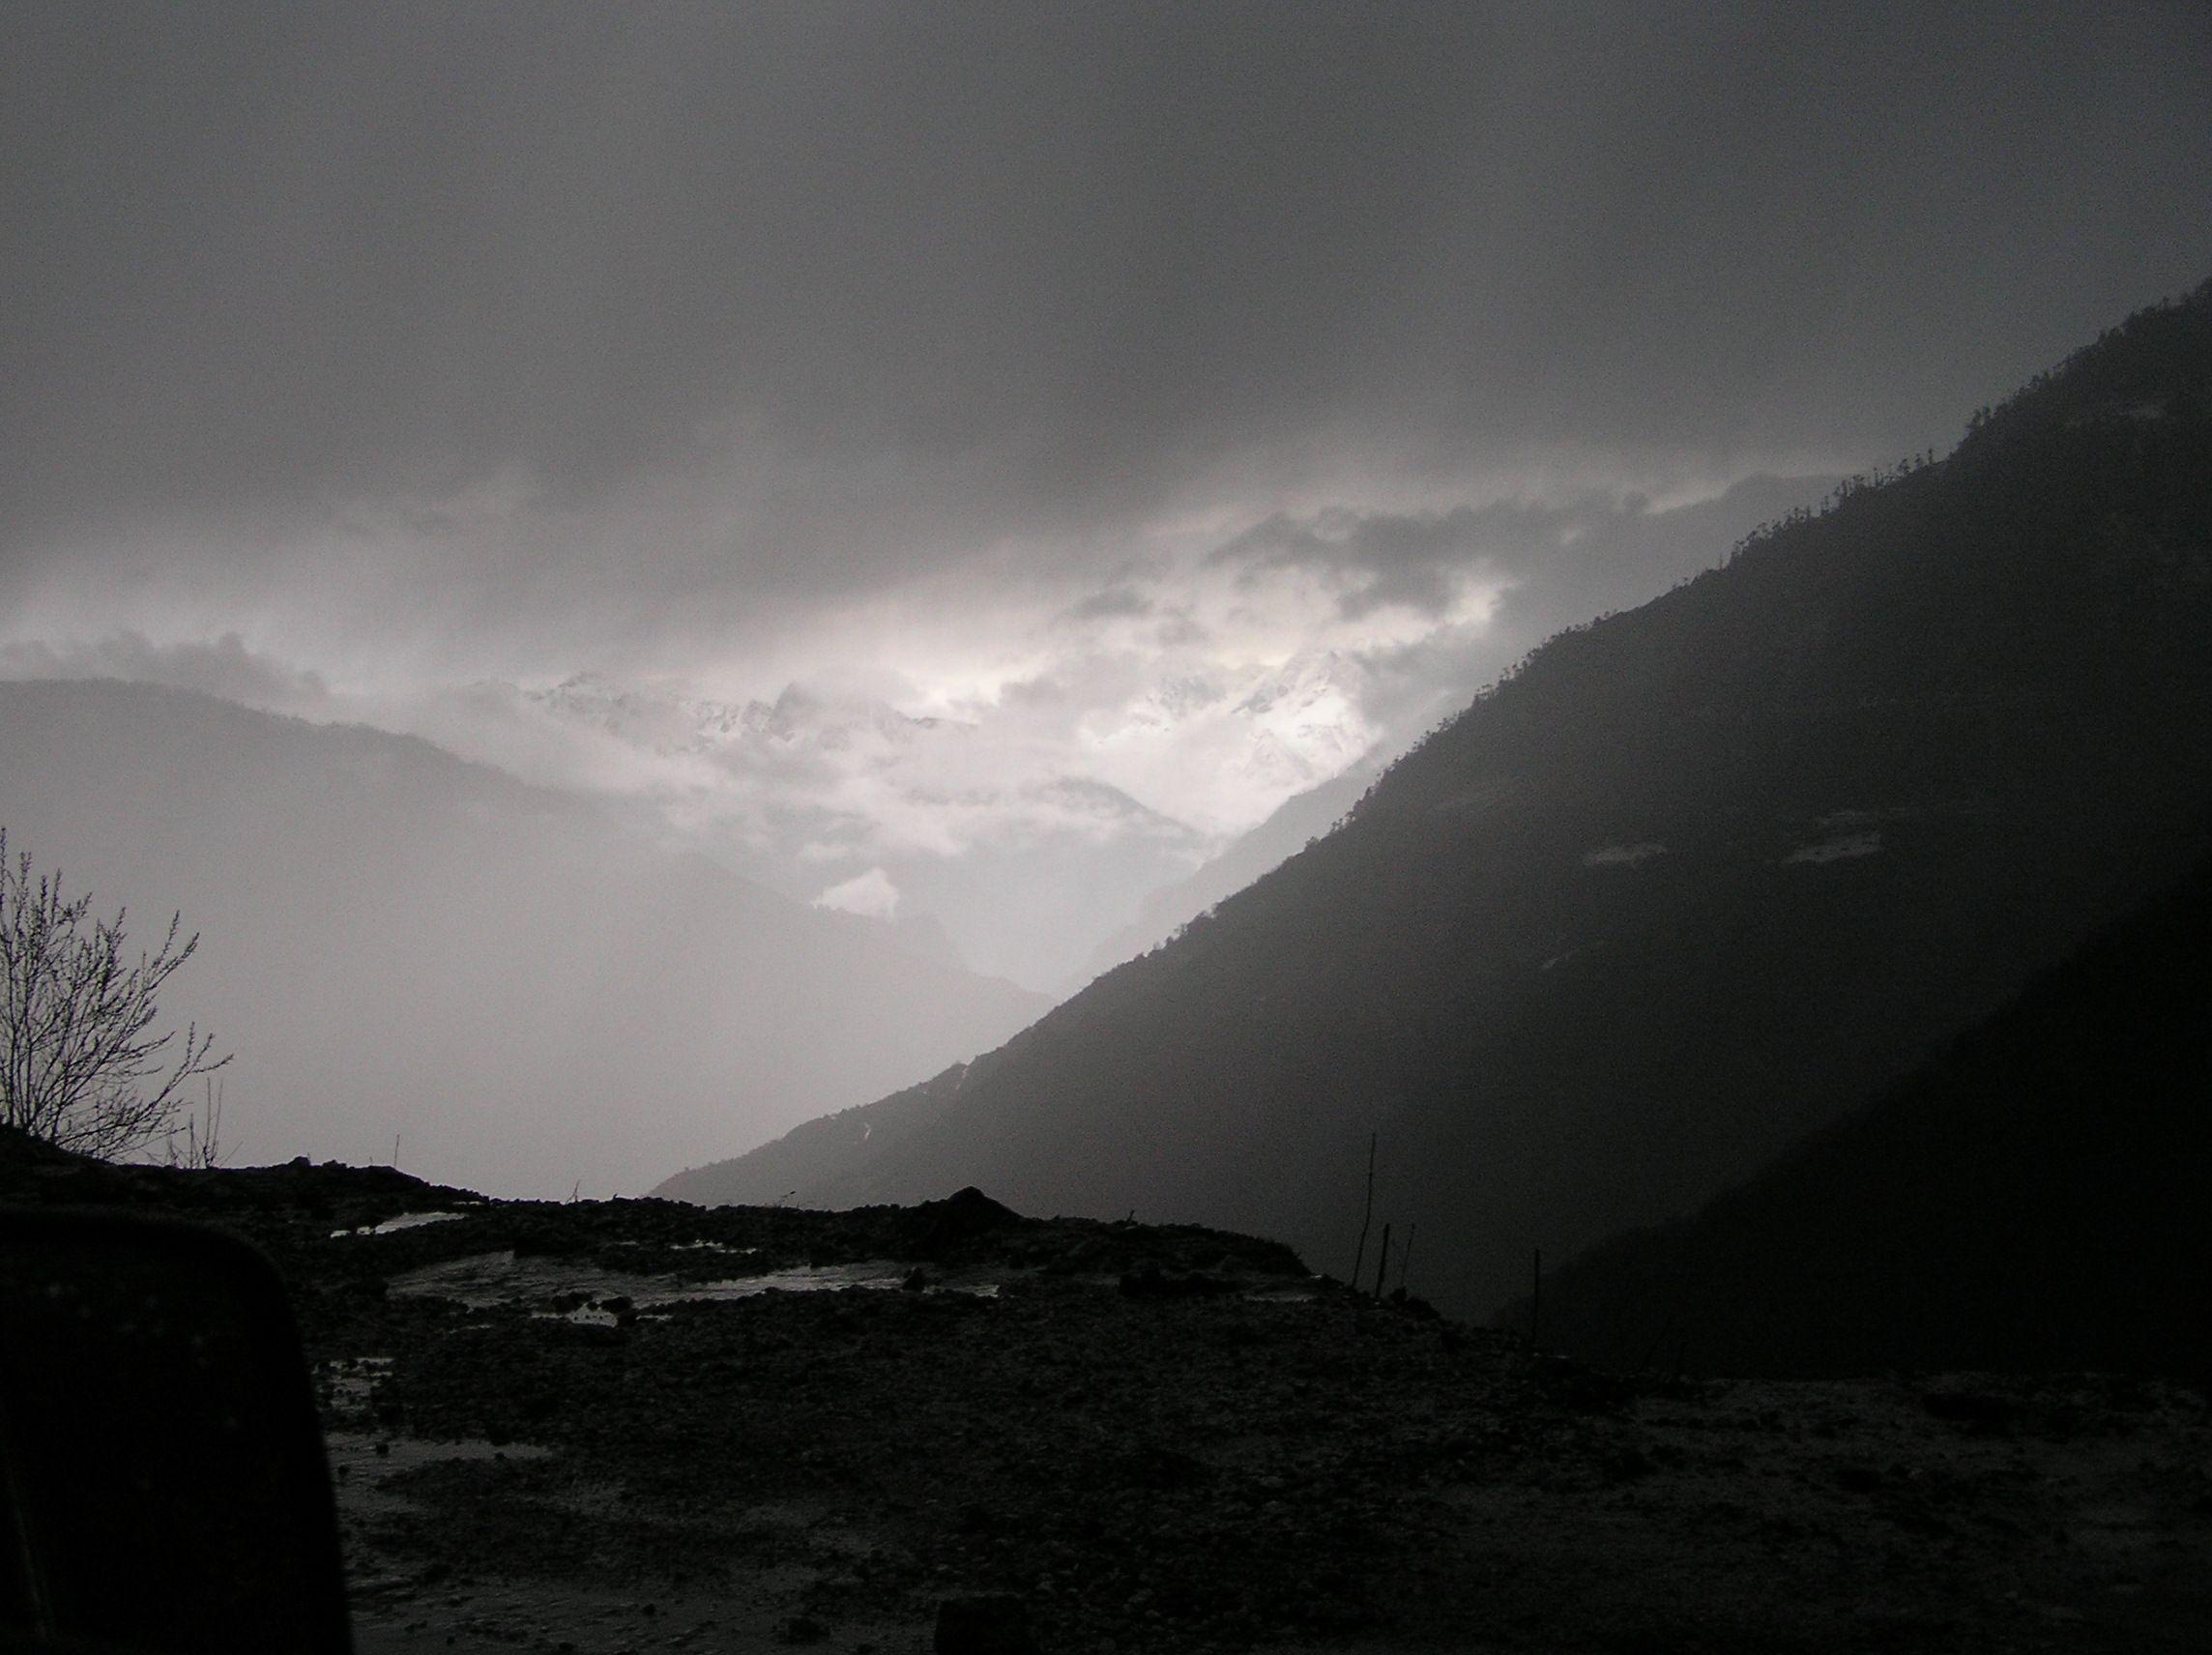 The mountain road leading to Tawang at nightfall. The